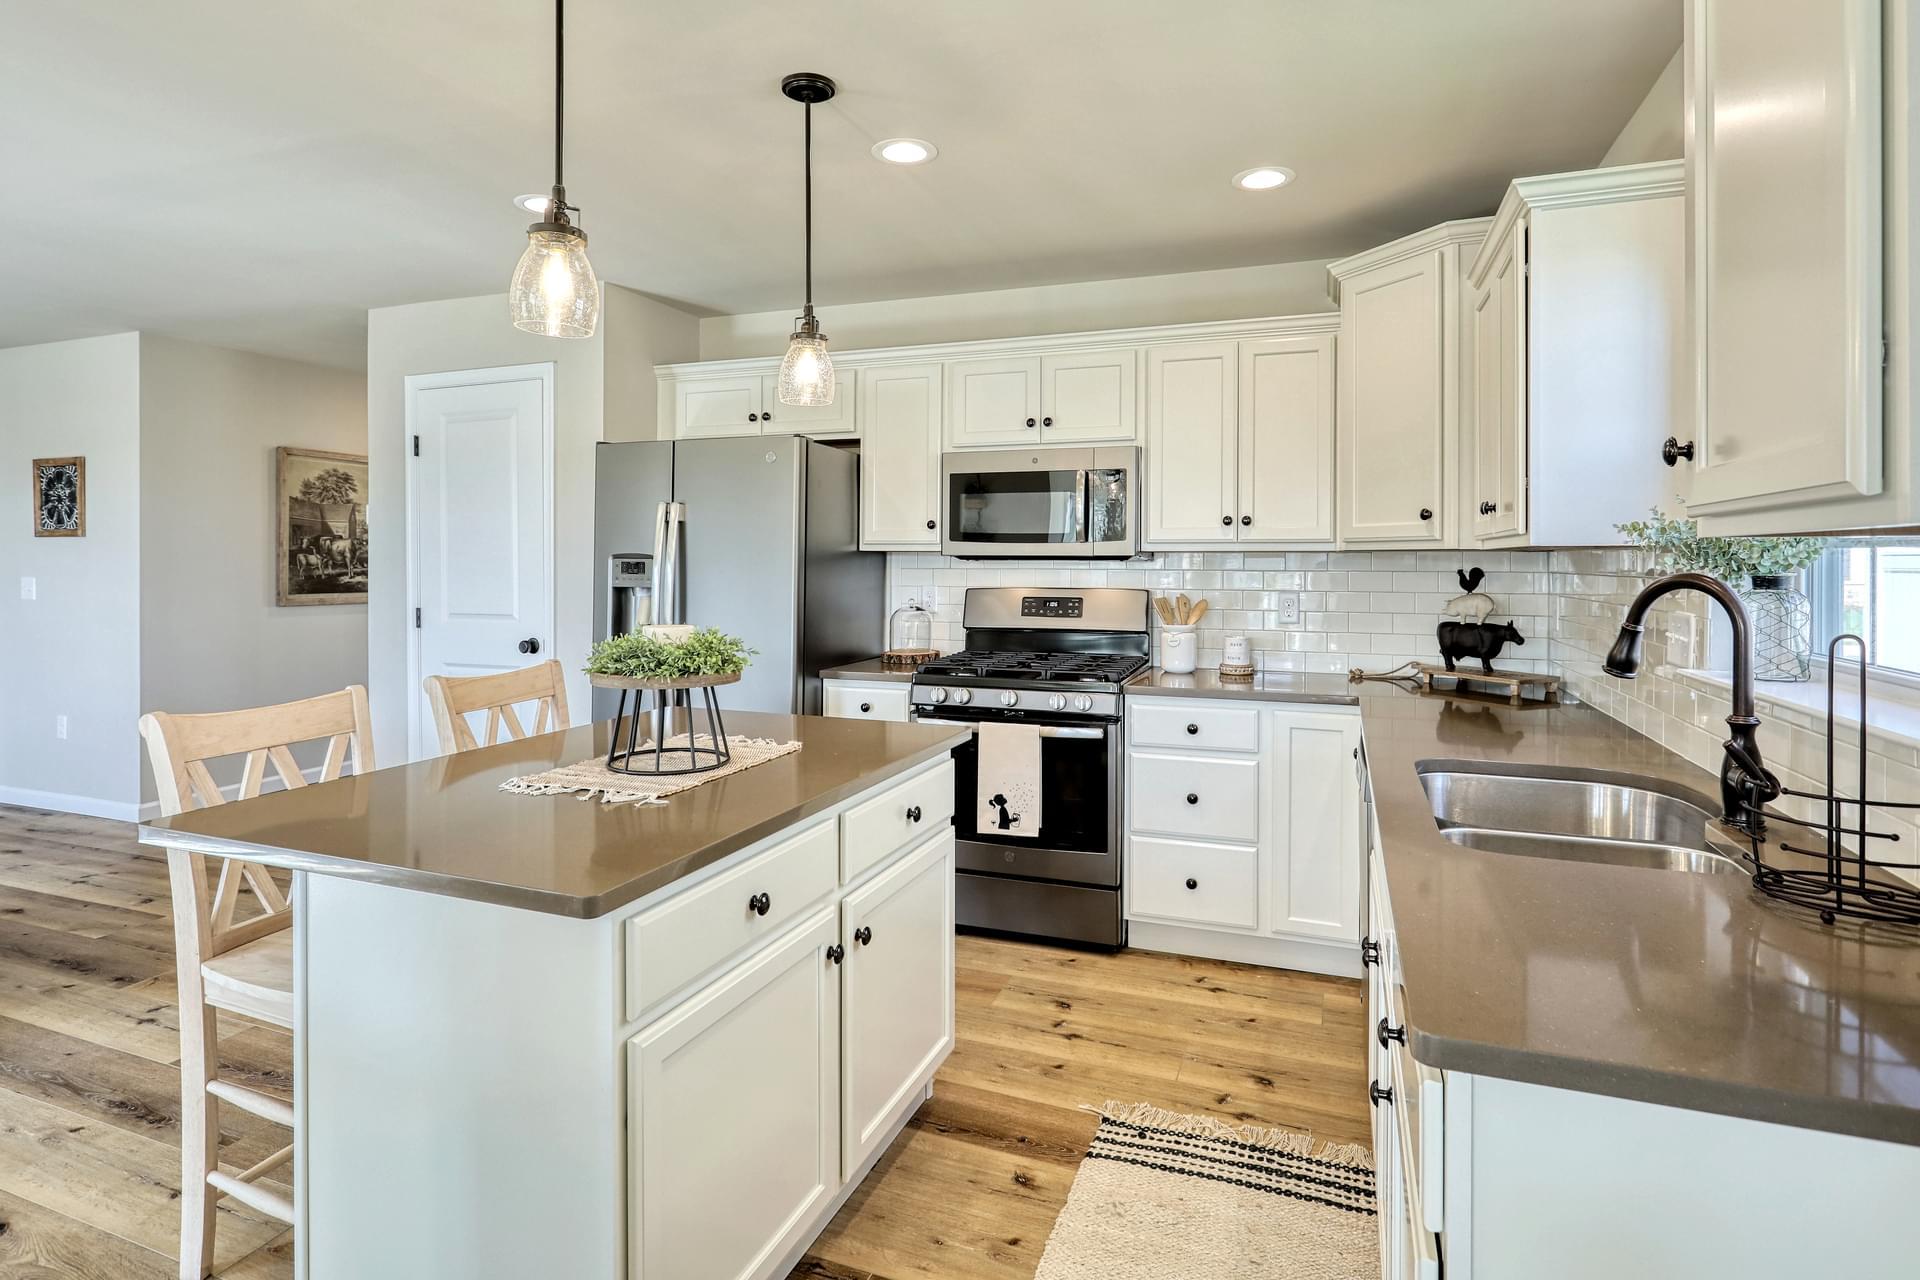 New Homes in Mechanicsburg, PA